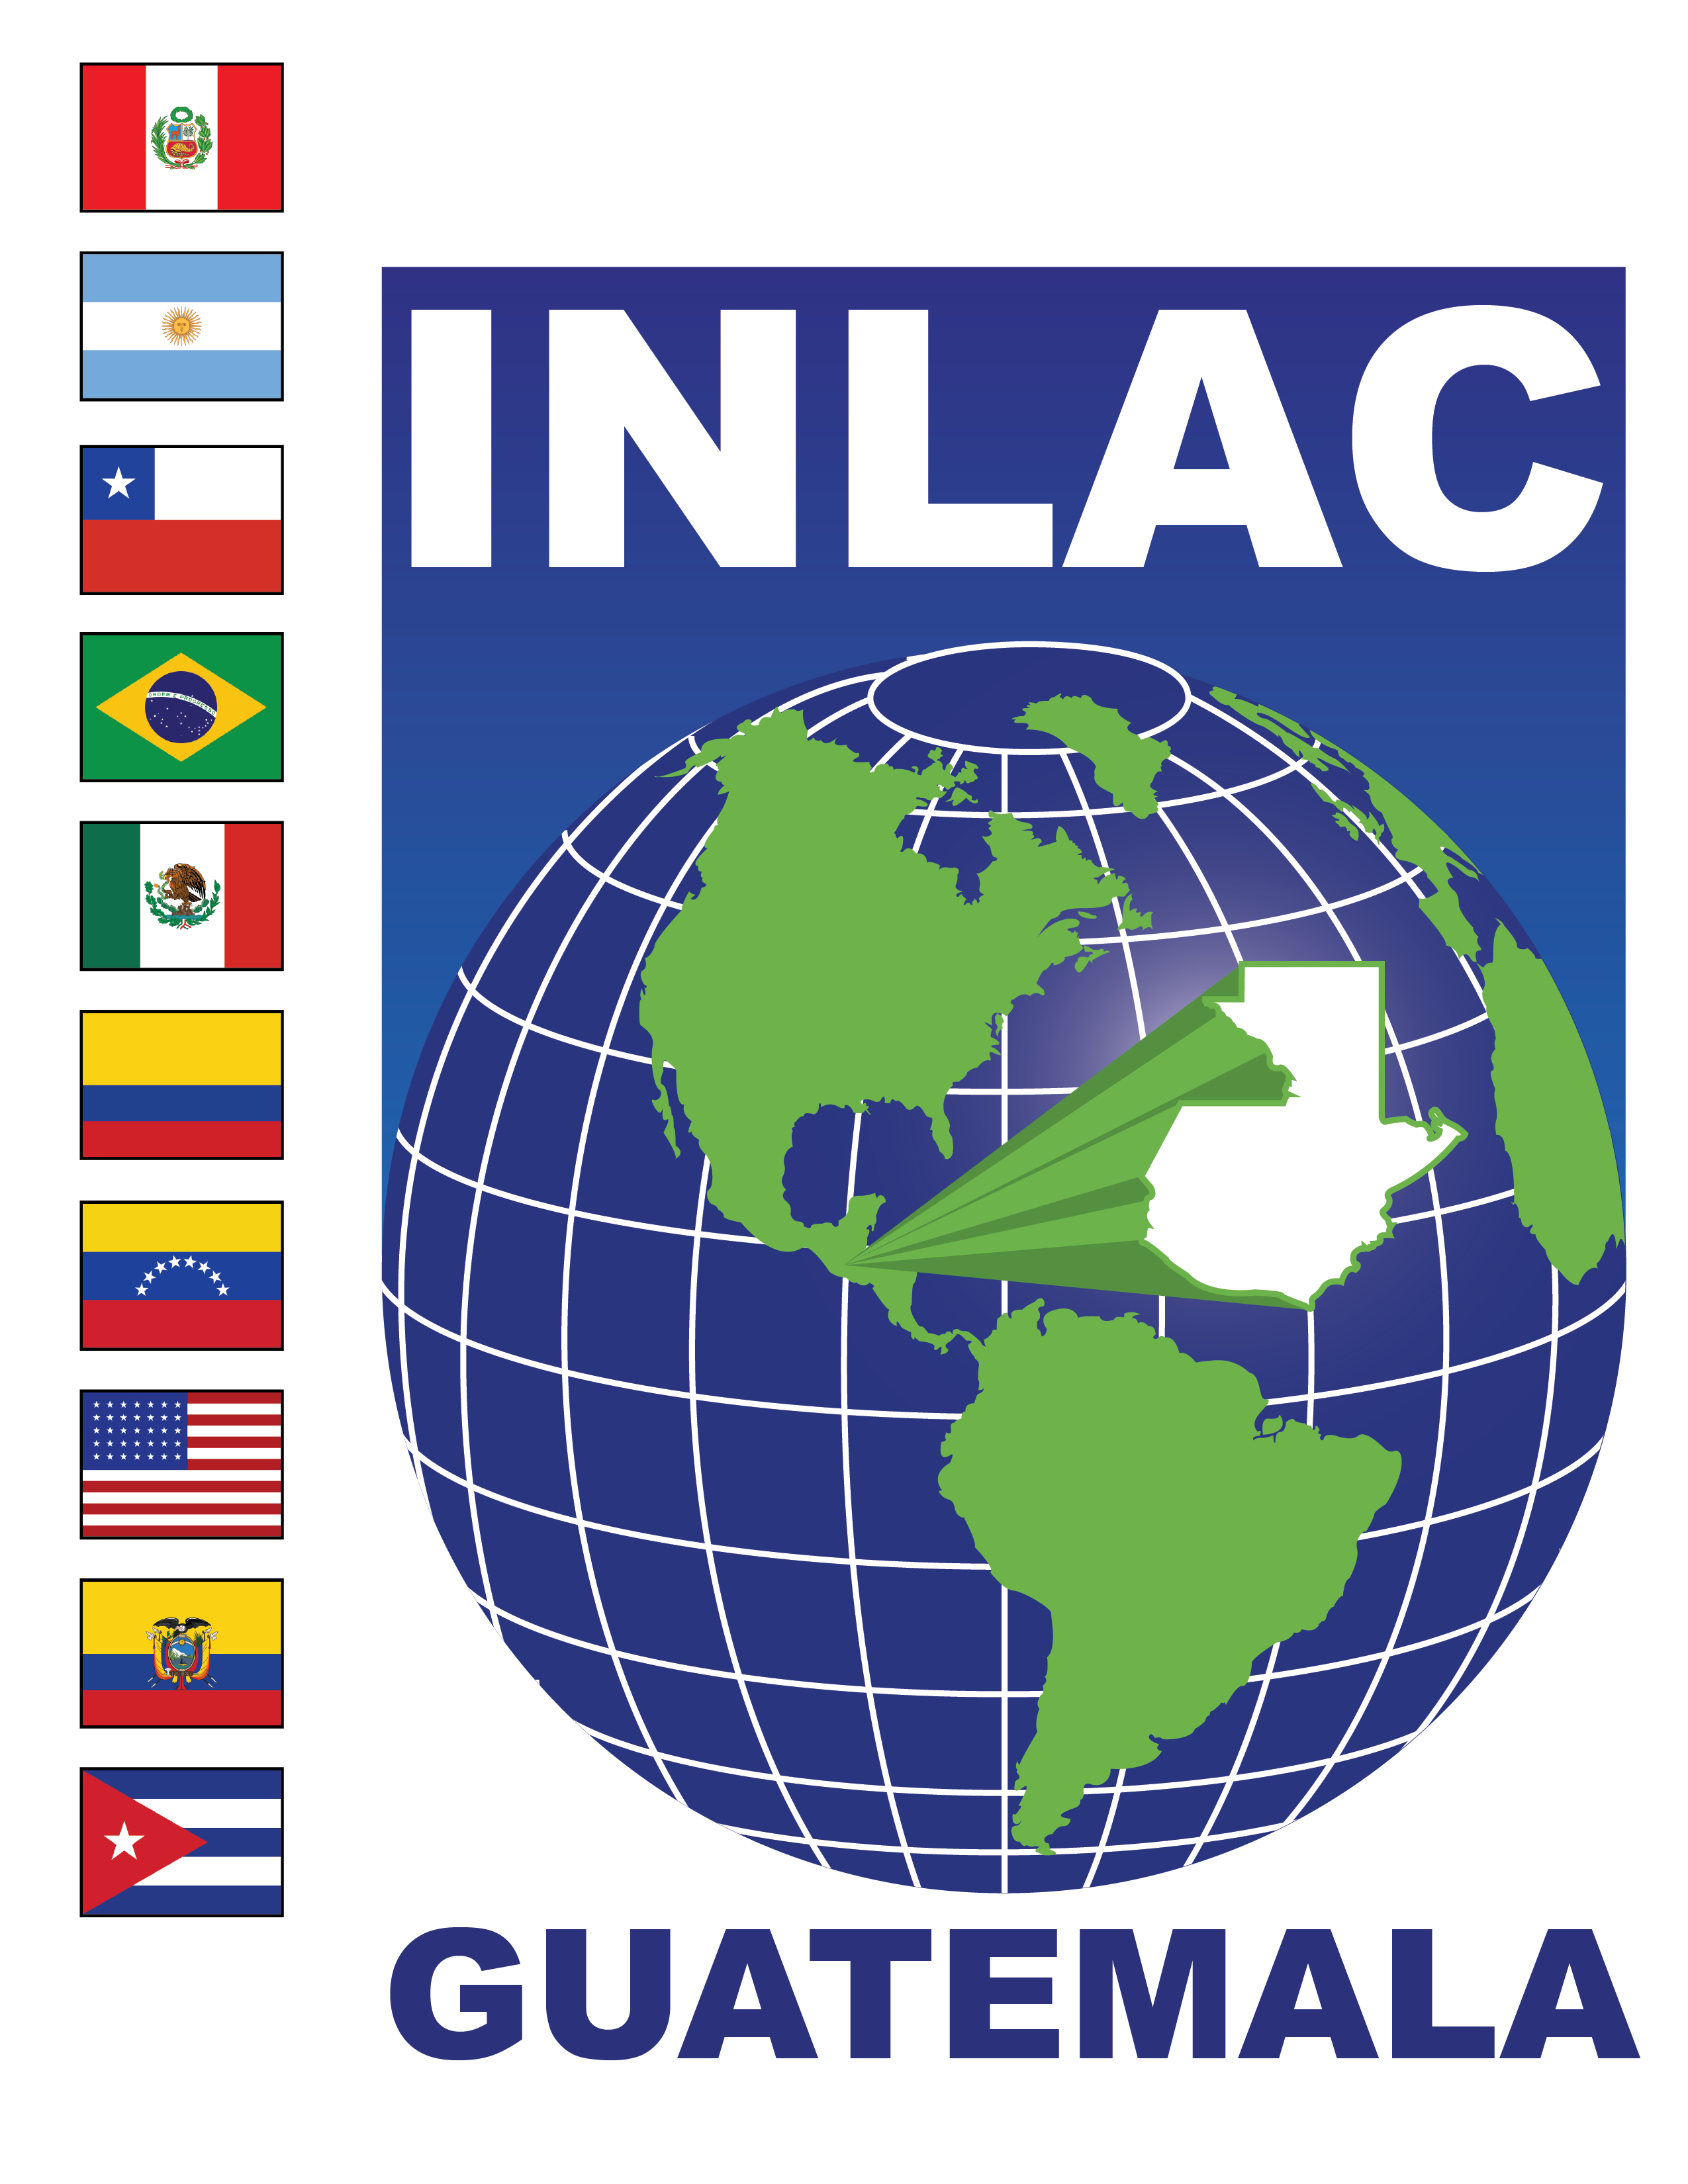 INLAC Guatemala